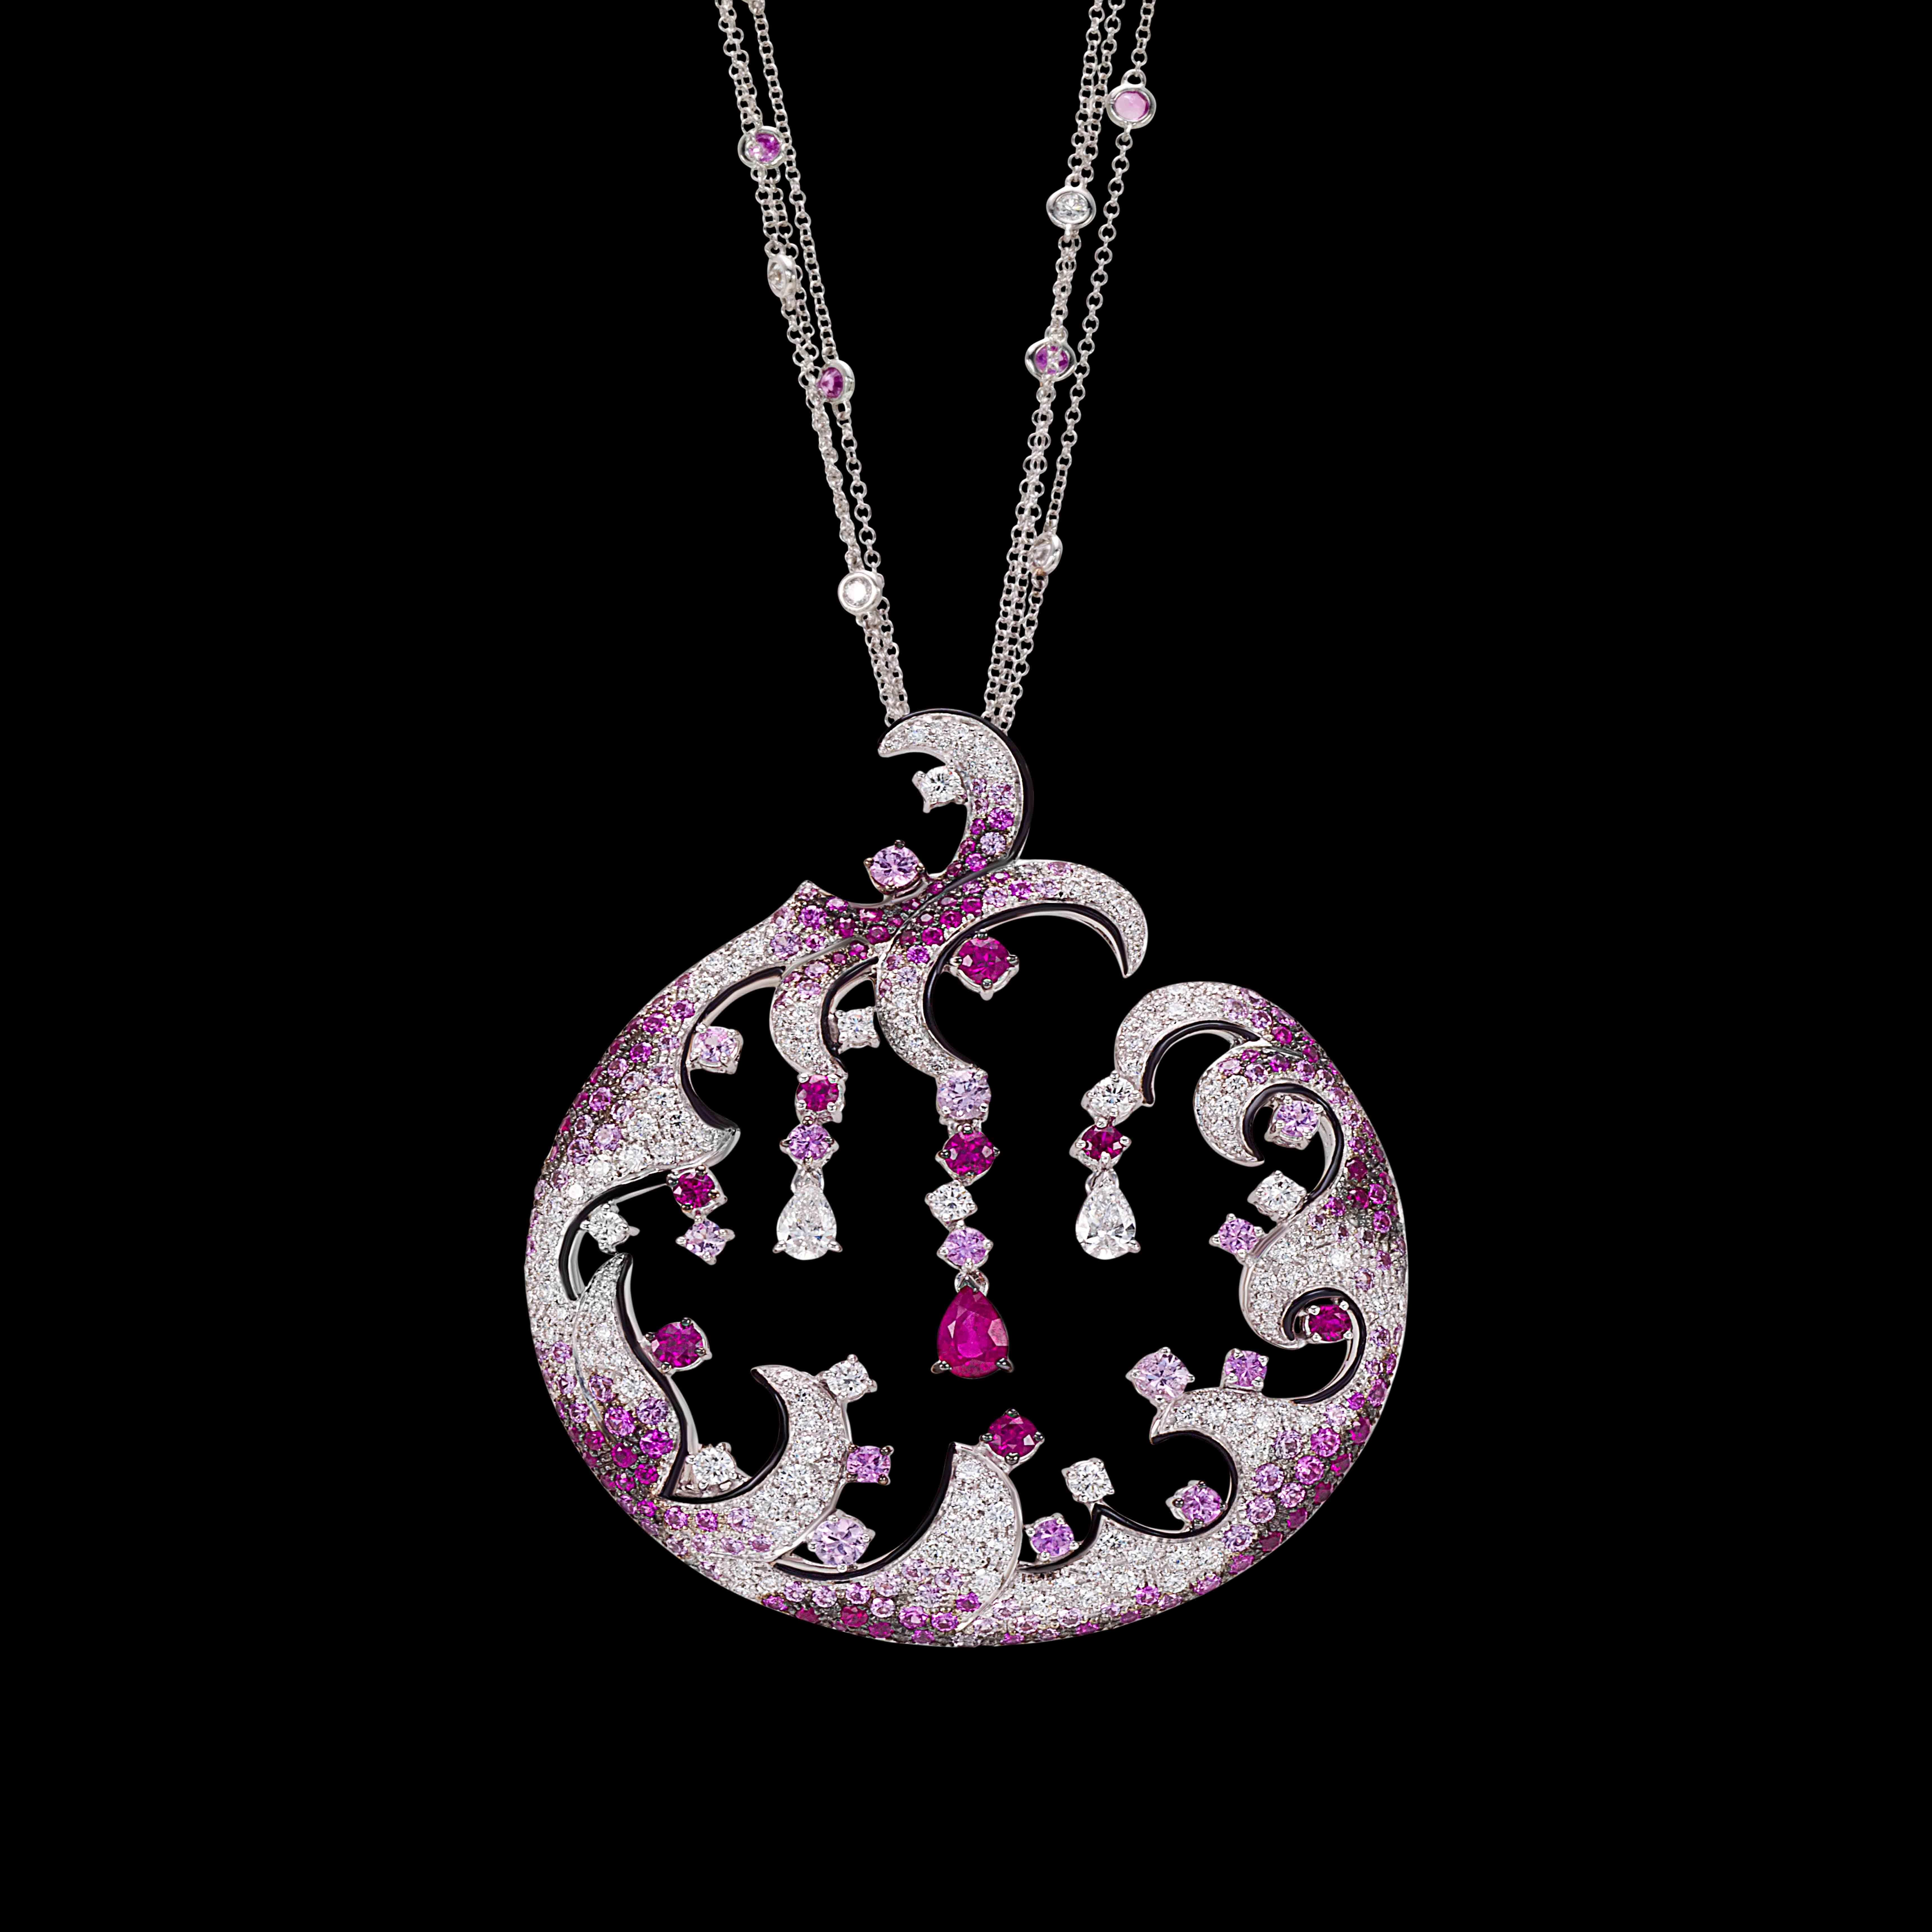 GR 1142 RZ - massimo raiteri exclusive jewellery gioielli